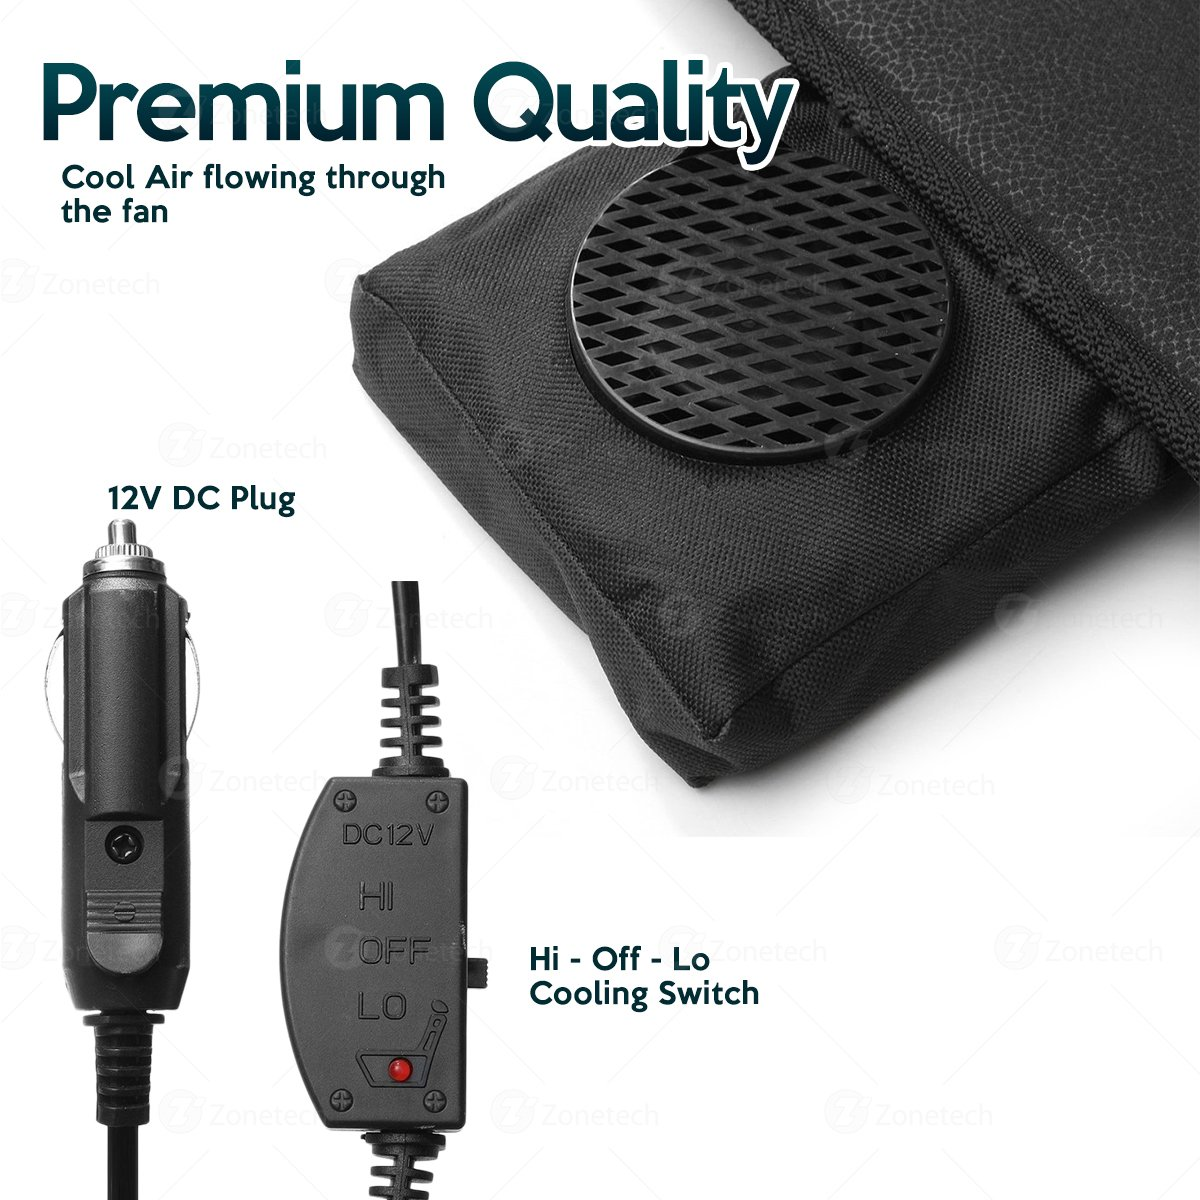 Zone Tech Cooling Car Seat Cushion Black 12V Automotive Adjustable Temperature Comfortable Cooling Car Seat Cushion Comfort Wheels